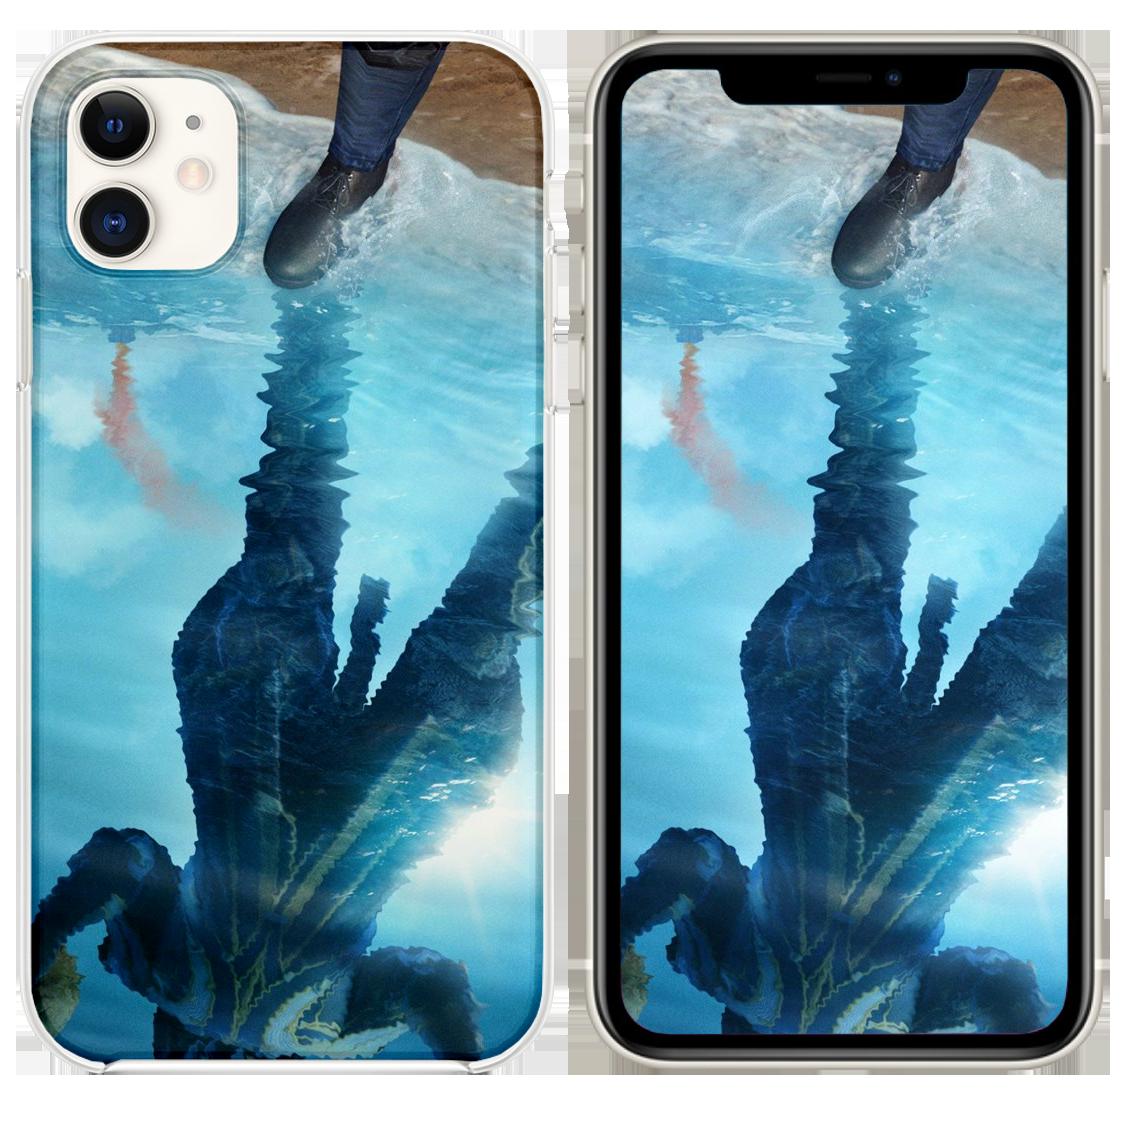 Pubg Season 8 2019 Iphone 11 Case Iphone 11 Wallpaper Iphone